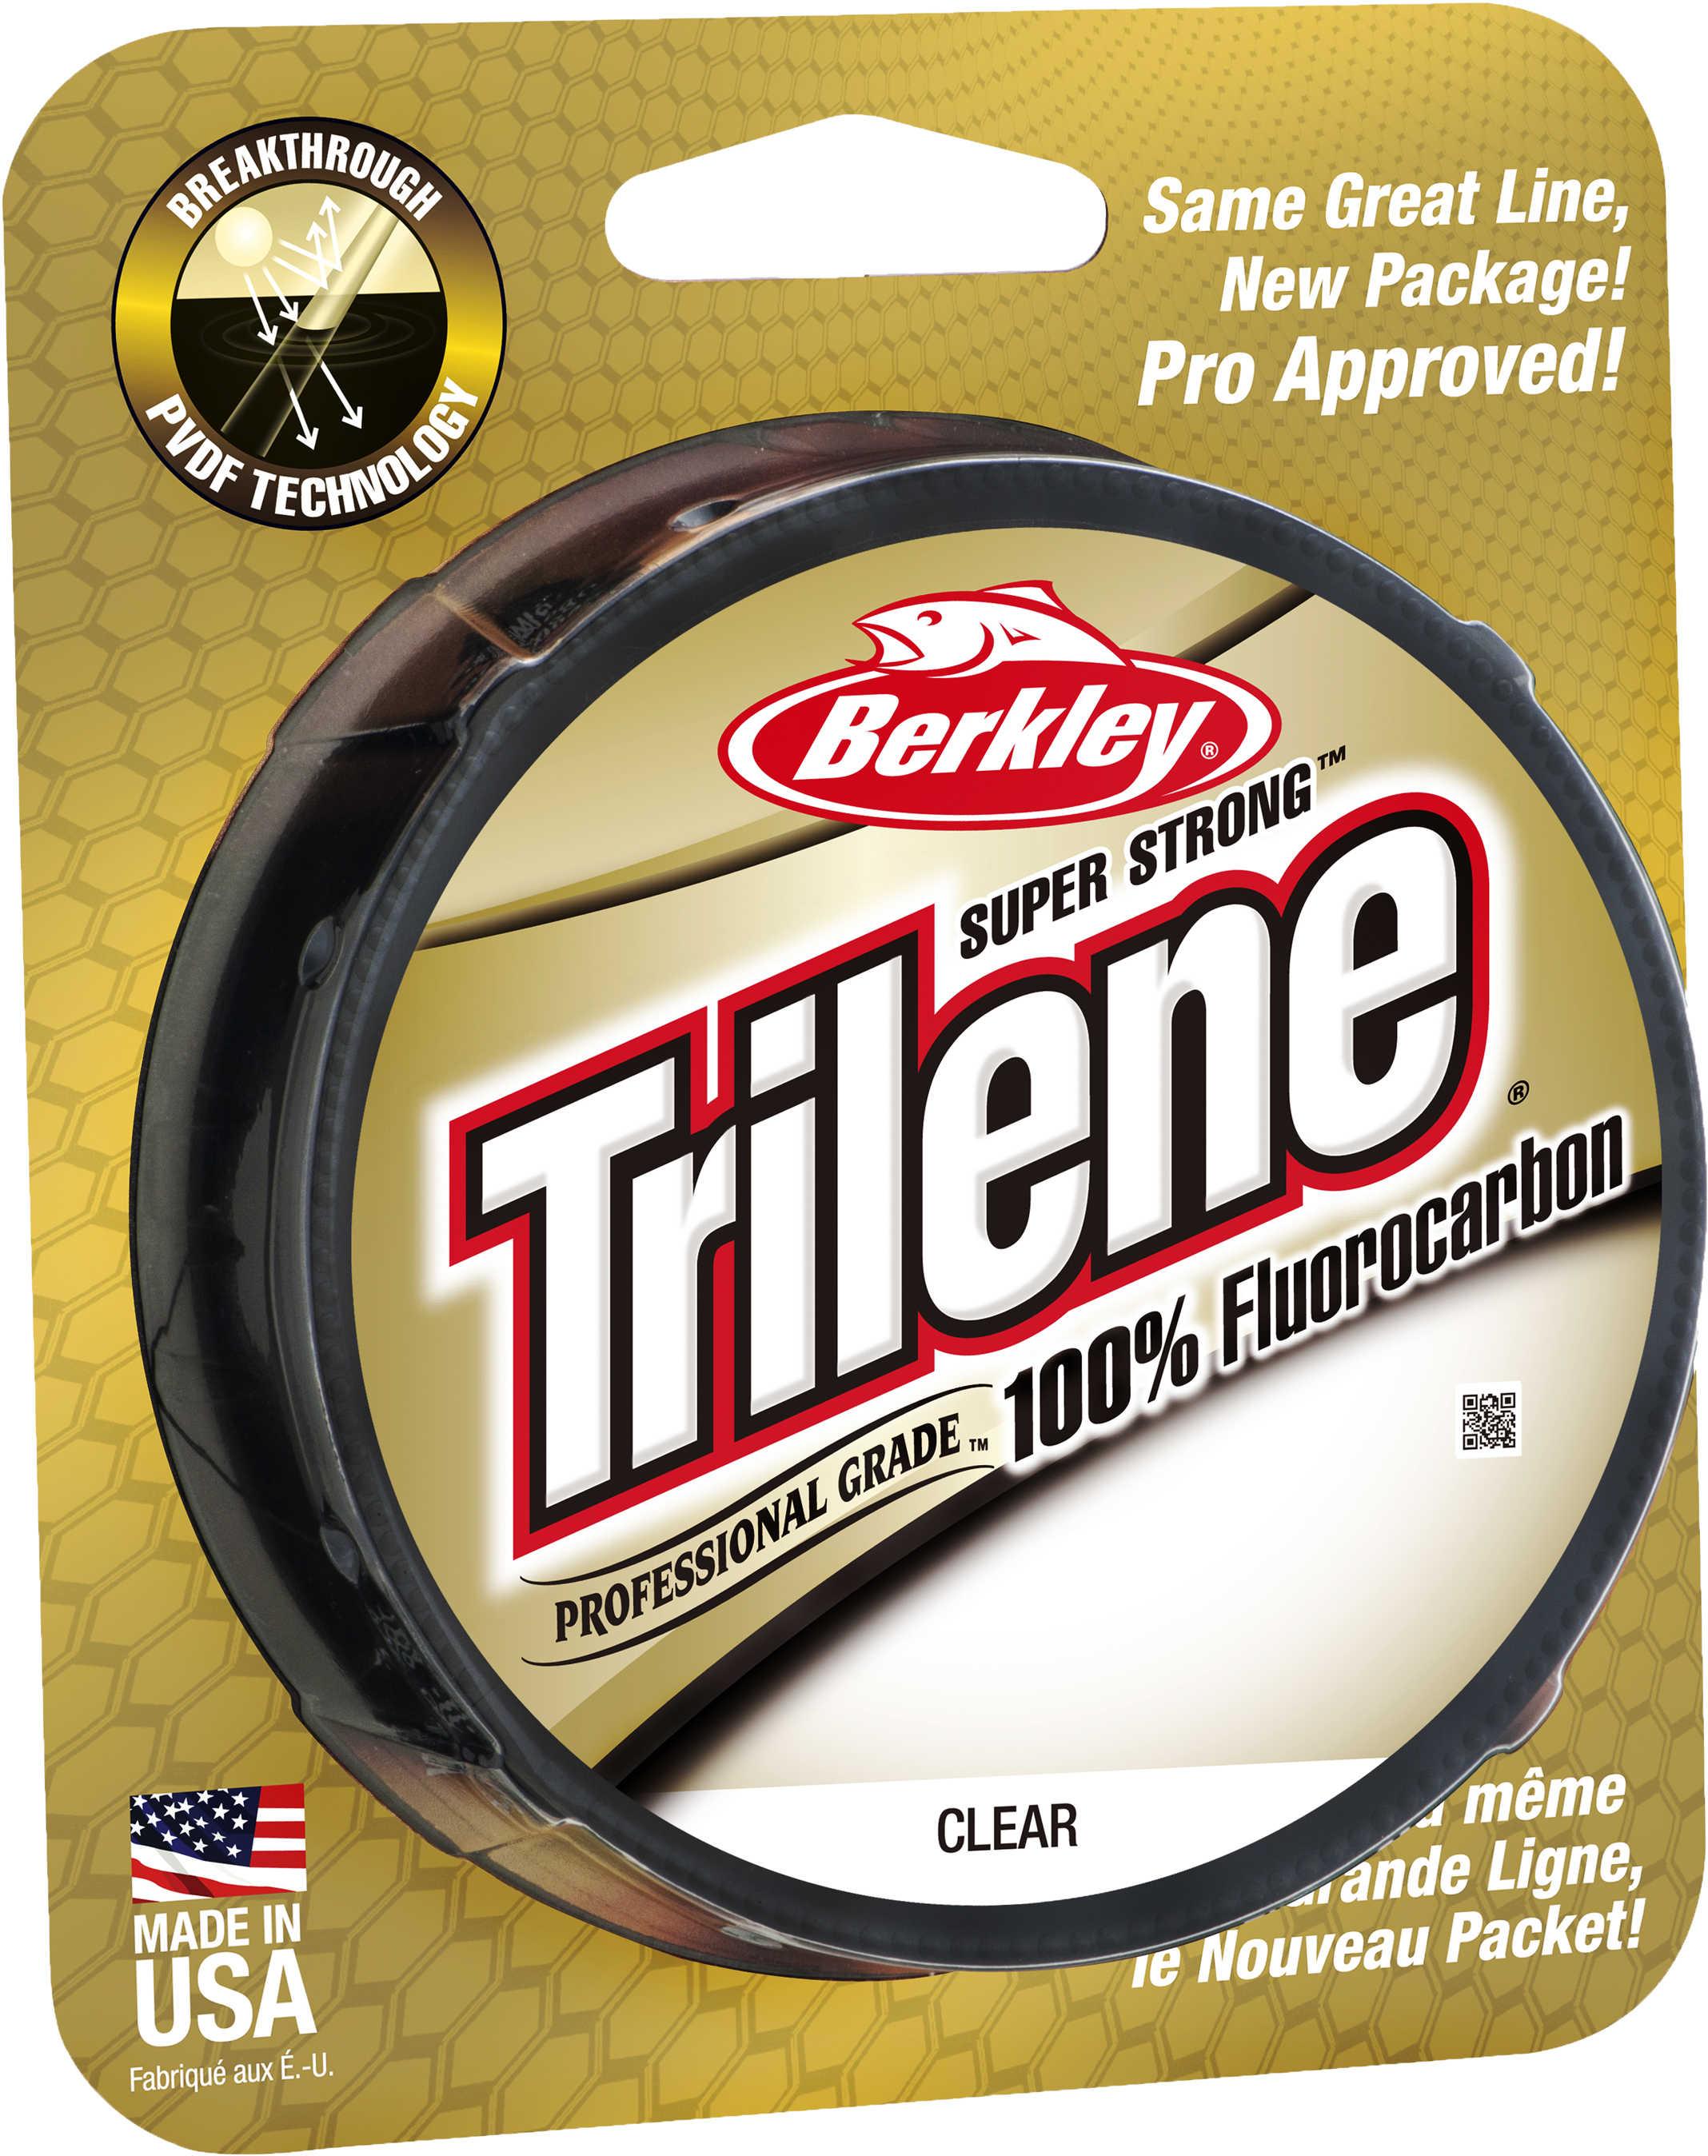 Berkley Trilene Fluorocarbon Professional Grade Filler Spool Line 20 lb, 200 Yards , Clear Md: 1313947